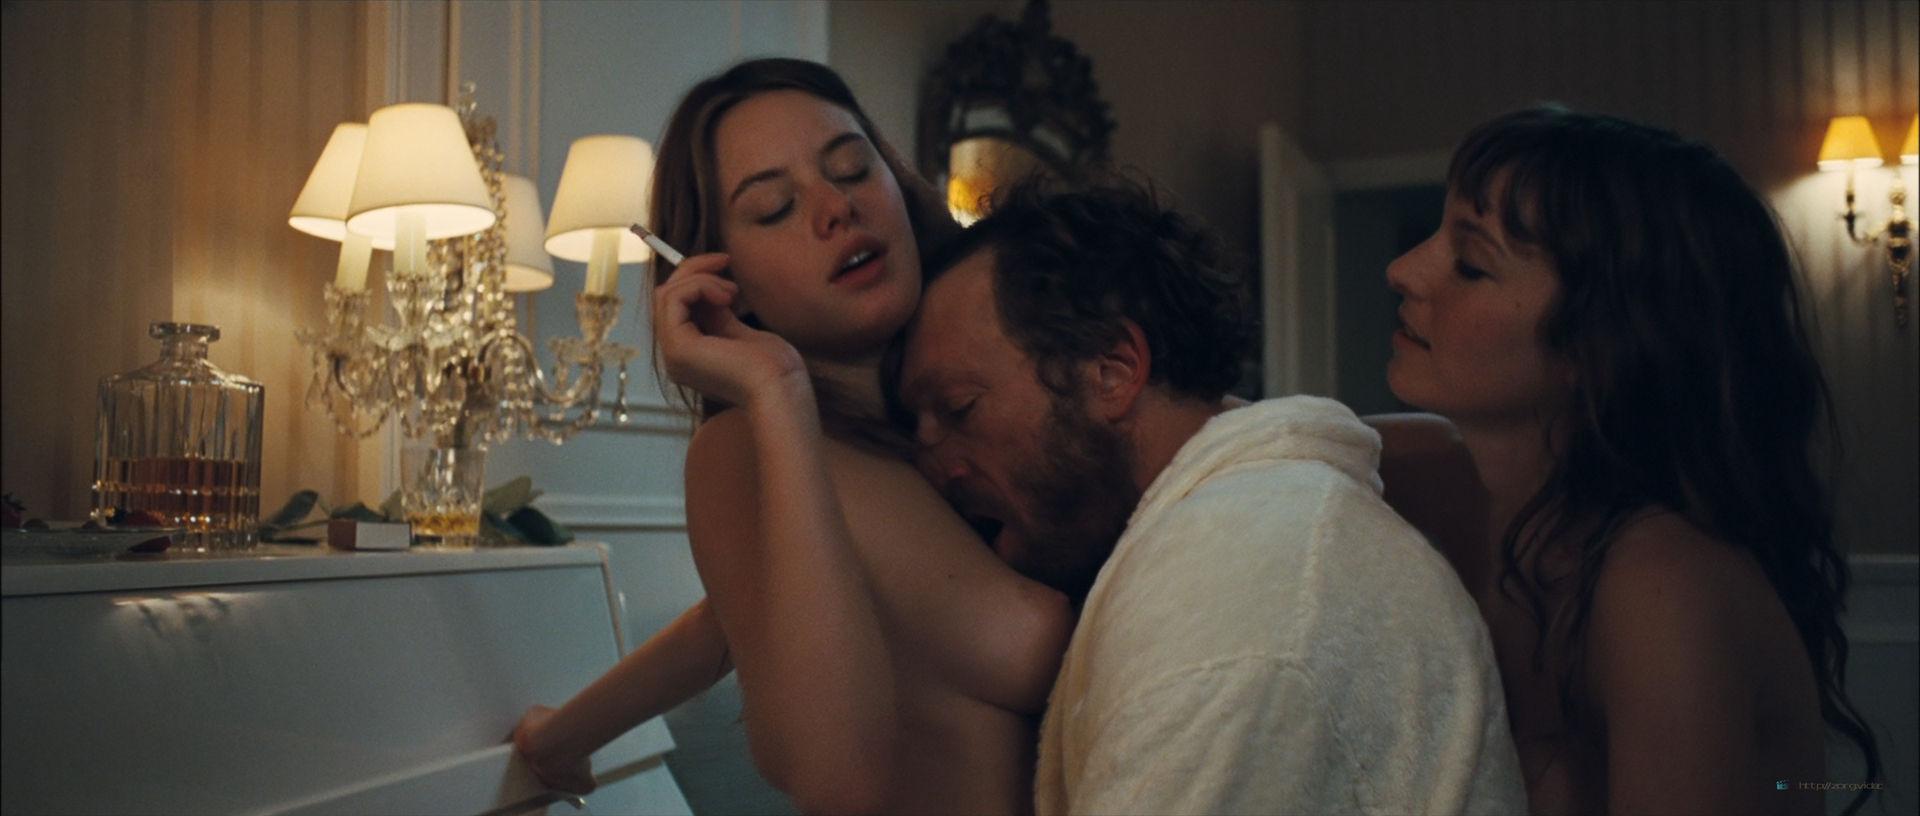 Camille Rowe nude and Josephine de La Baume nude sex threesome - Notre jour viendra (FR-2010) HD 1080p BluRay (8)